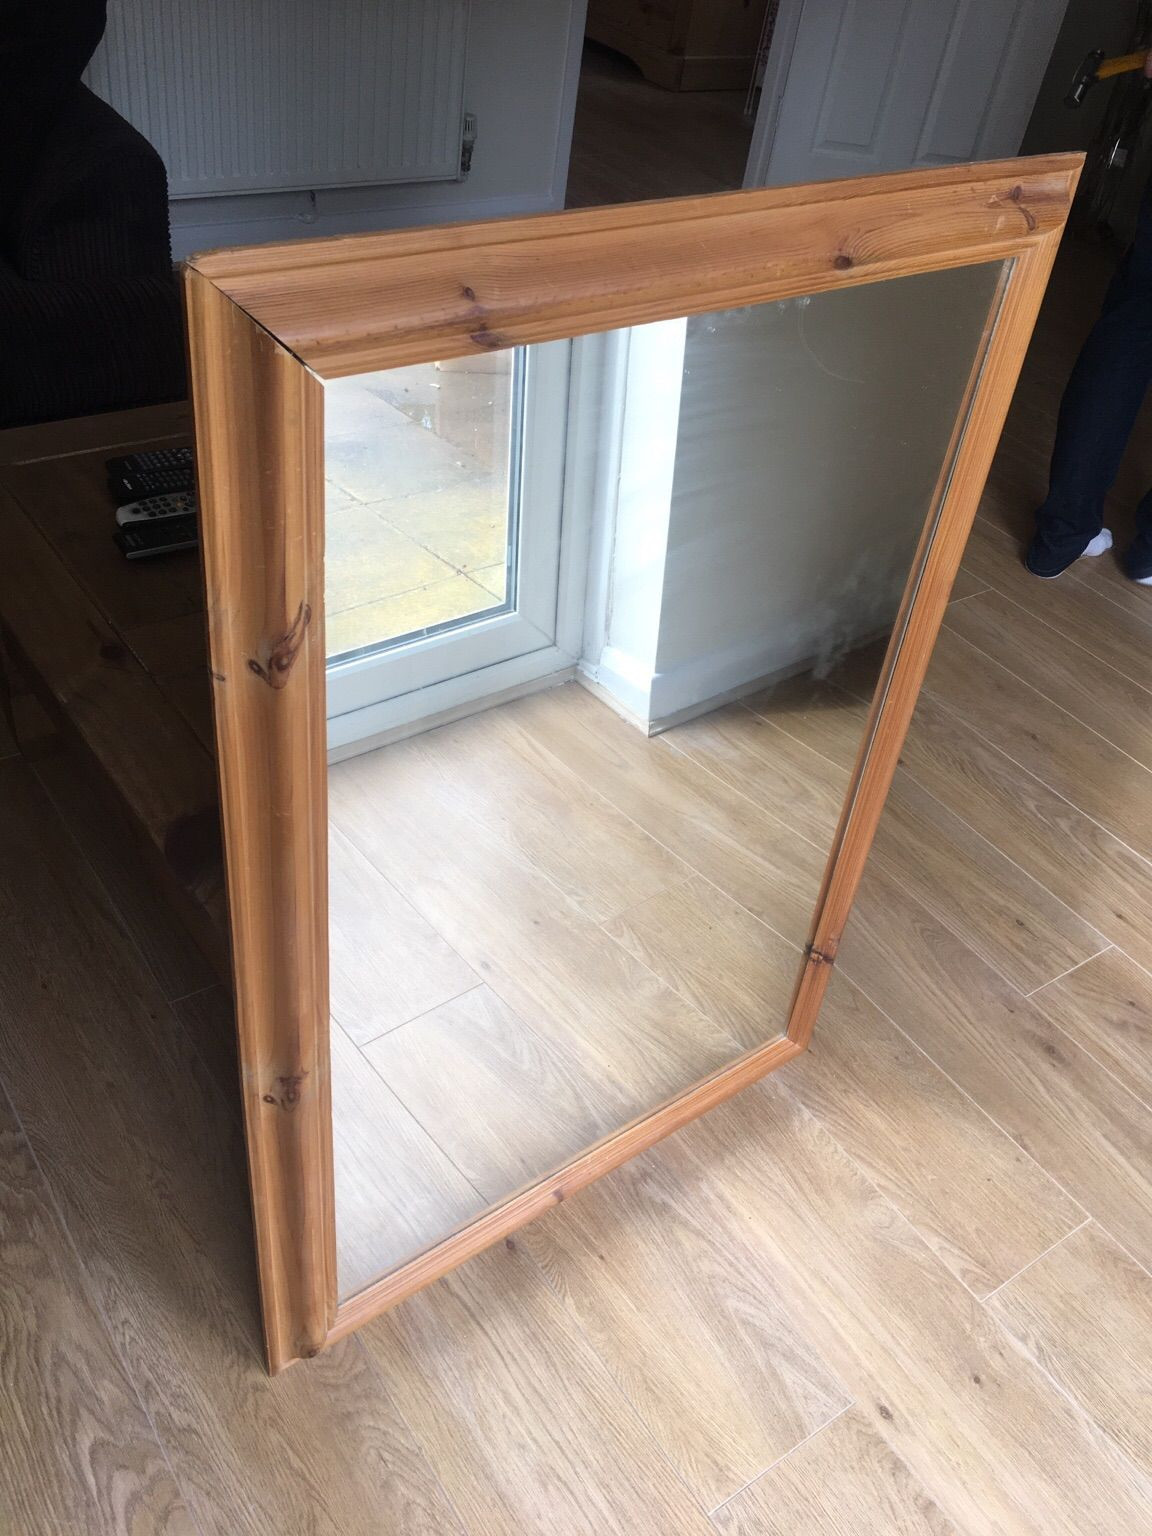 hardwood floor refinishing west hartford ct of https en shpock com i wl n5c b0y9di0wk 2017 04 23t101325 with large mirror 7f3d3896